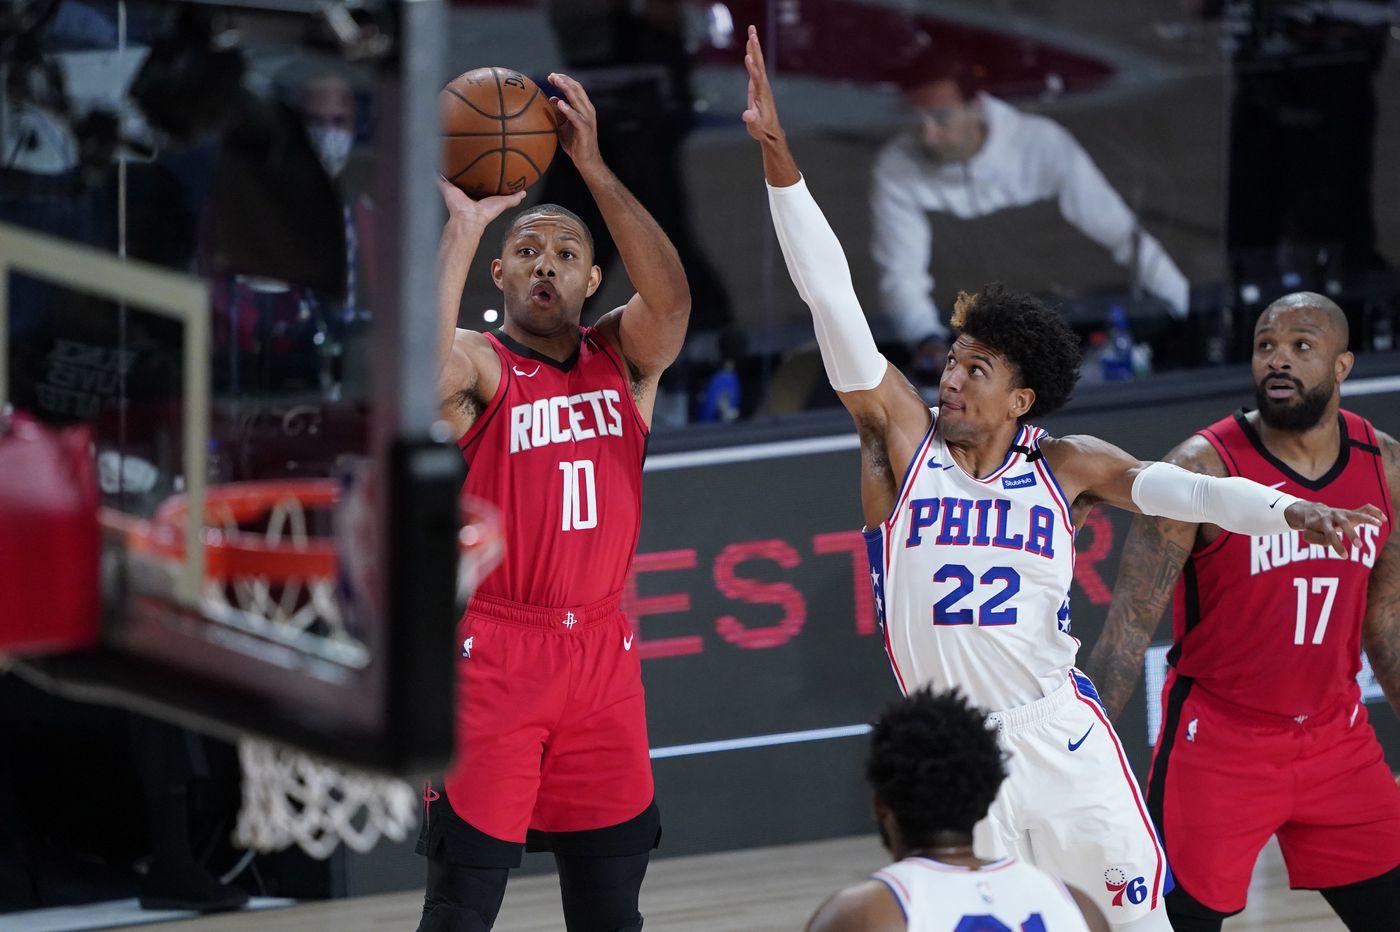 Sixers-Rockets best-worst: Matisse Thybulle's milestones, Houston's three-point woes, Tobias Harris' team highs